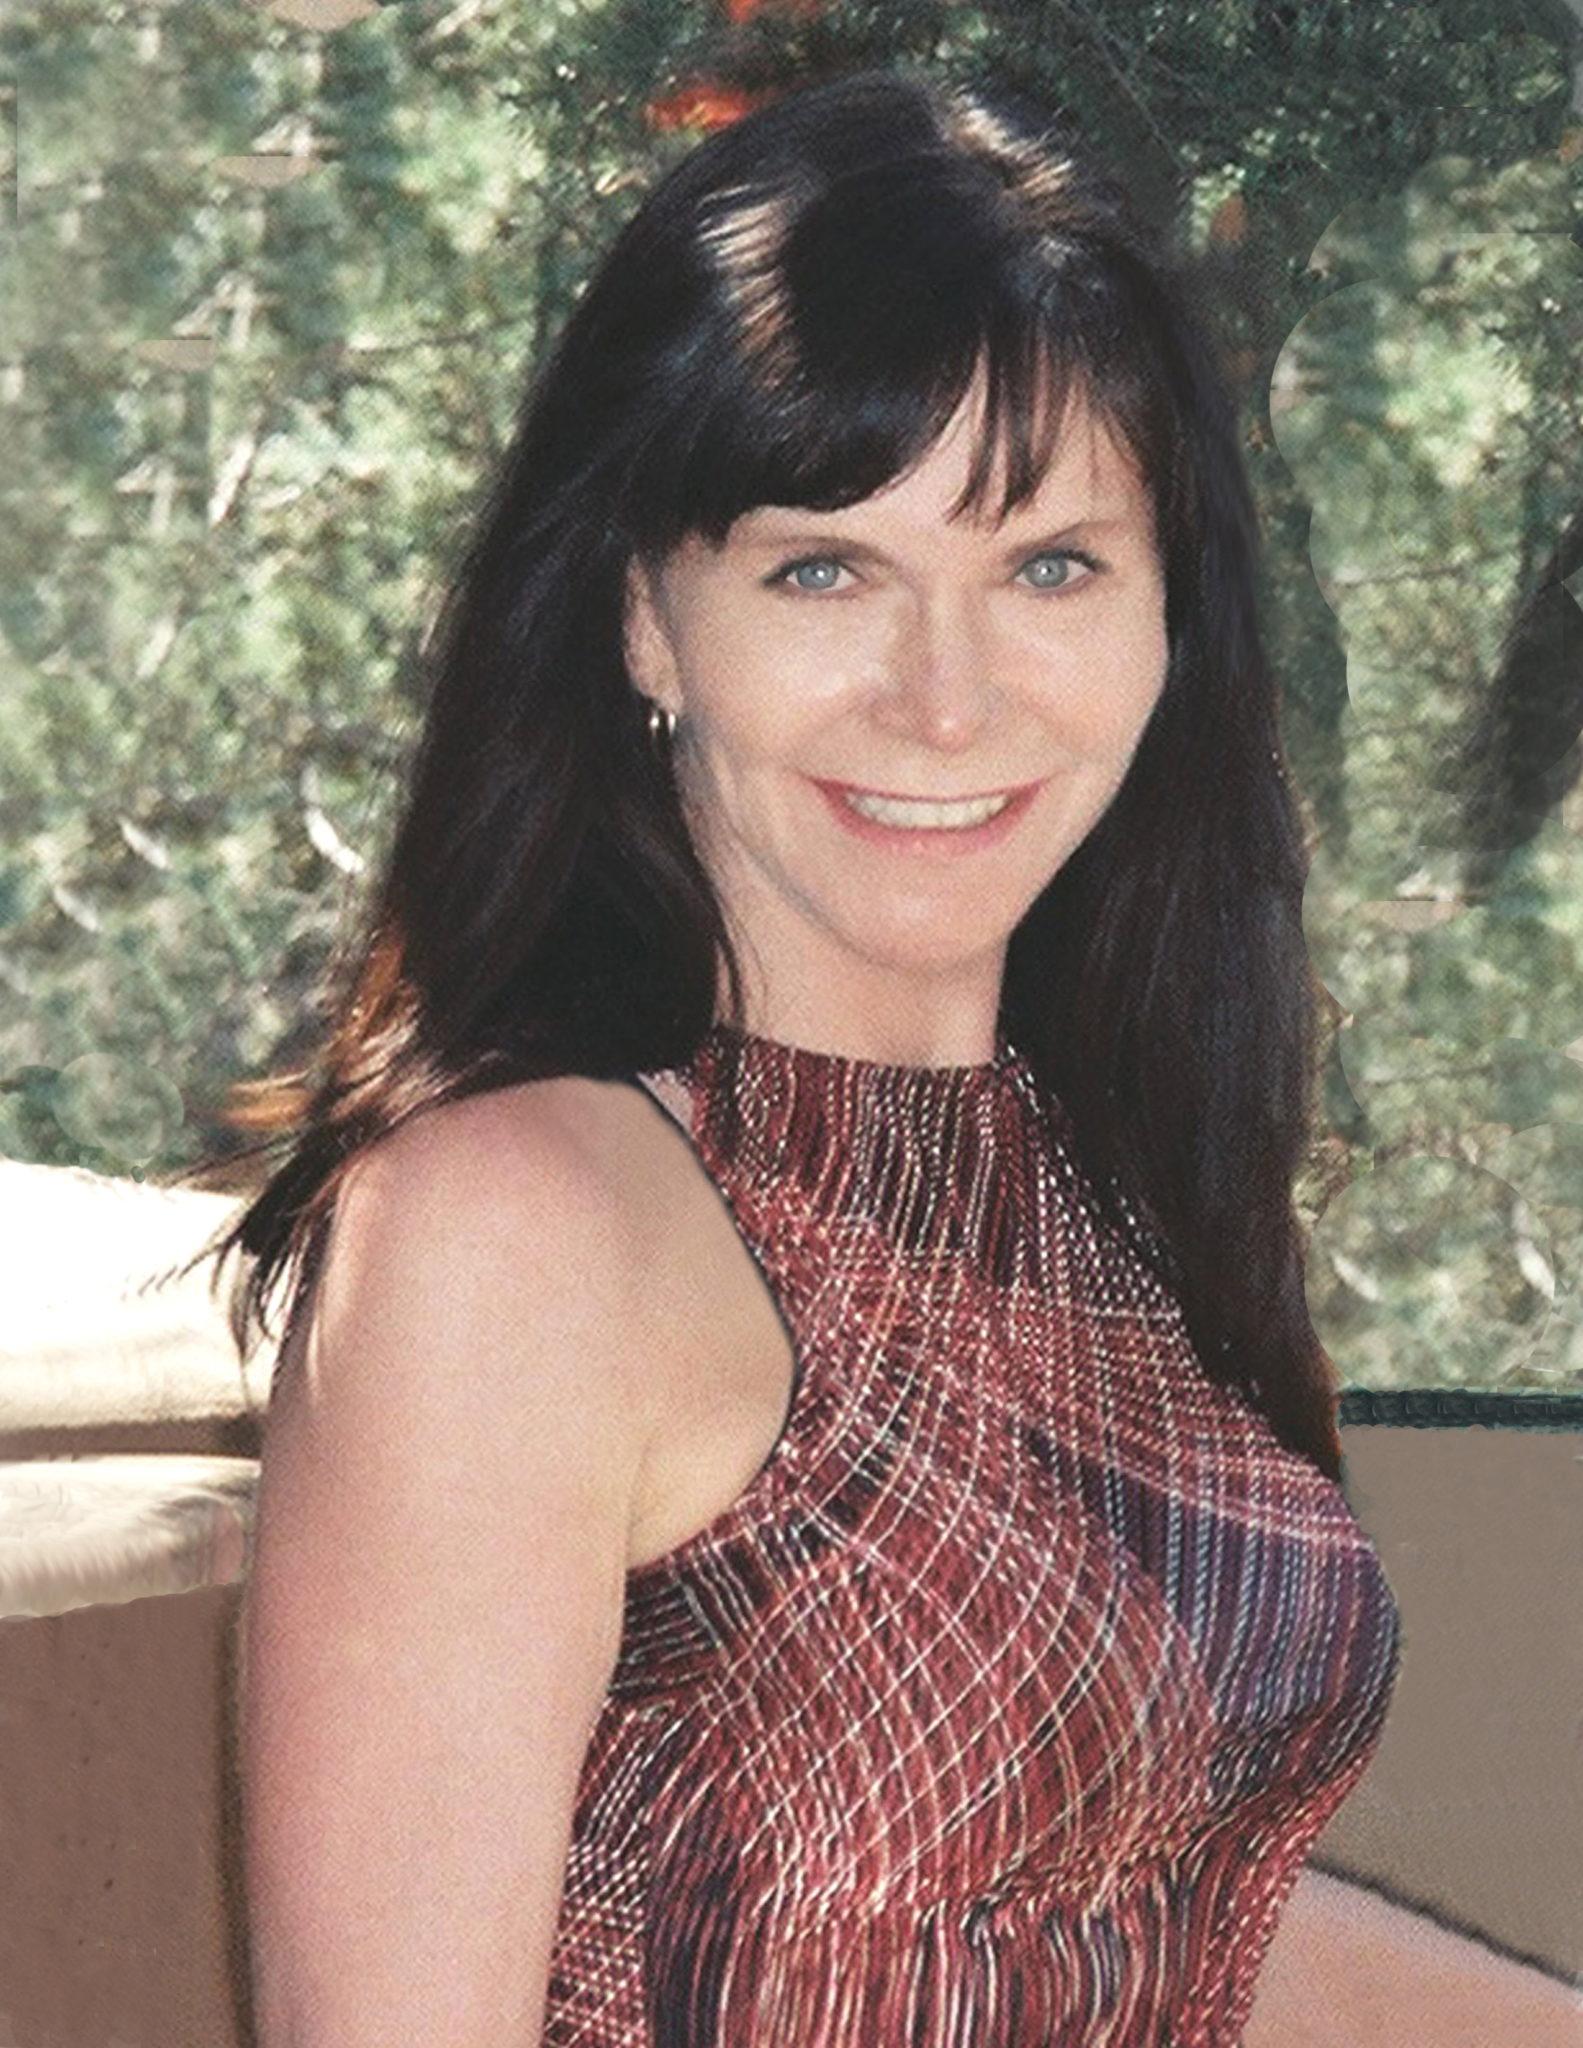 Linda Deir: 2550x3300-px-300-dpi-right